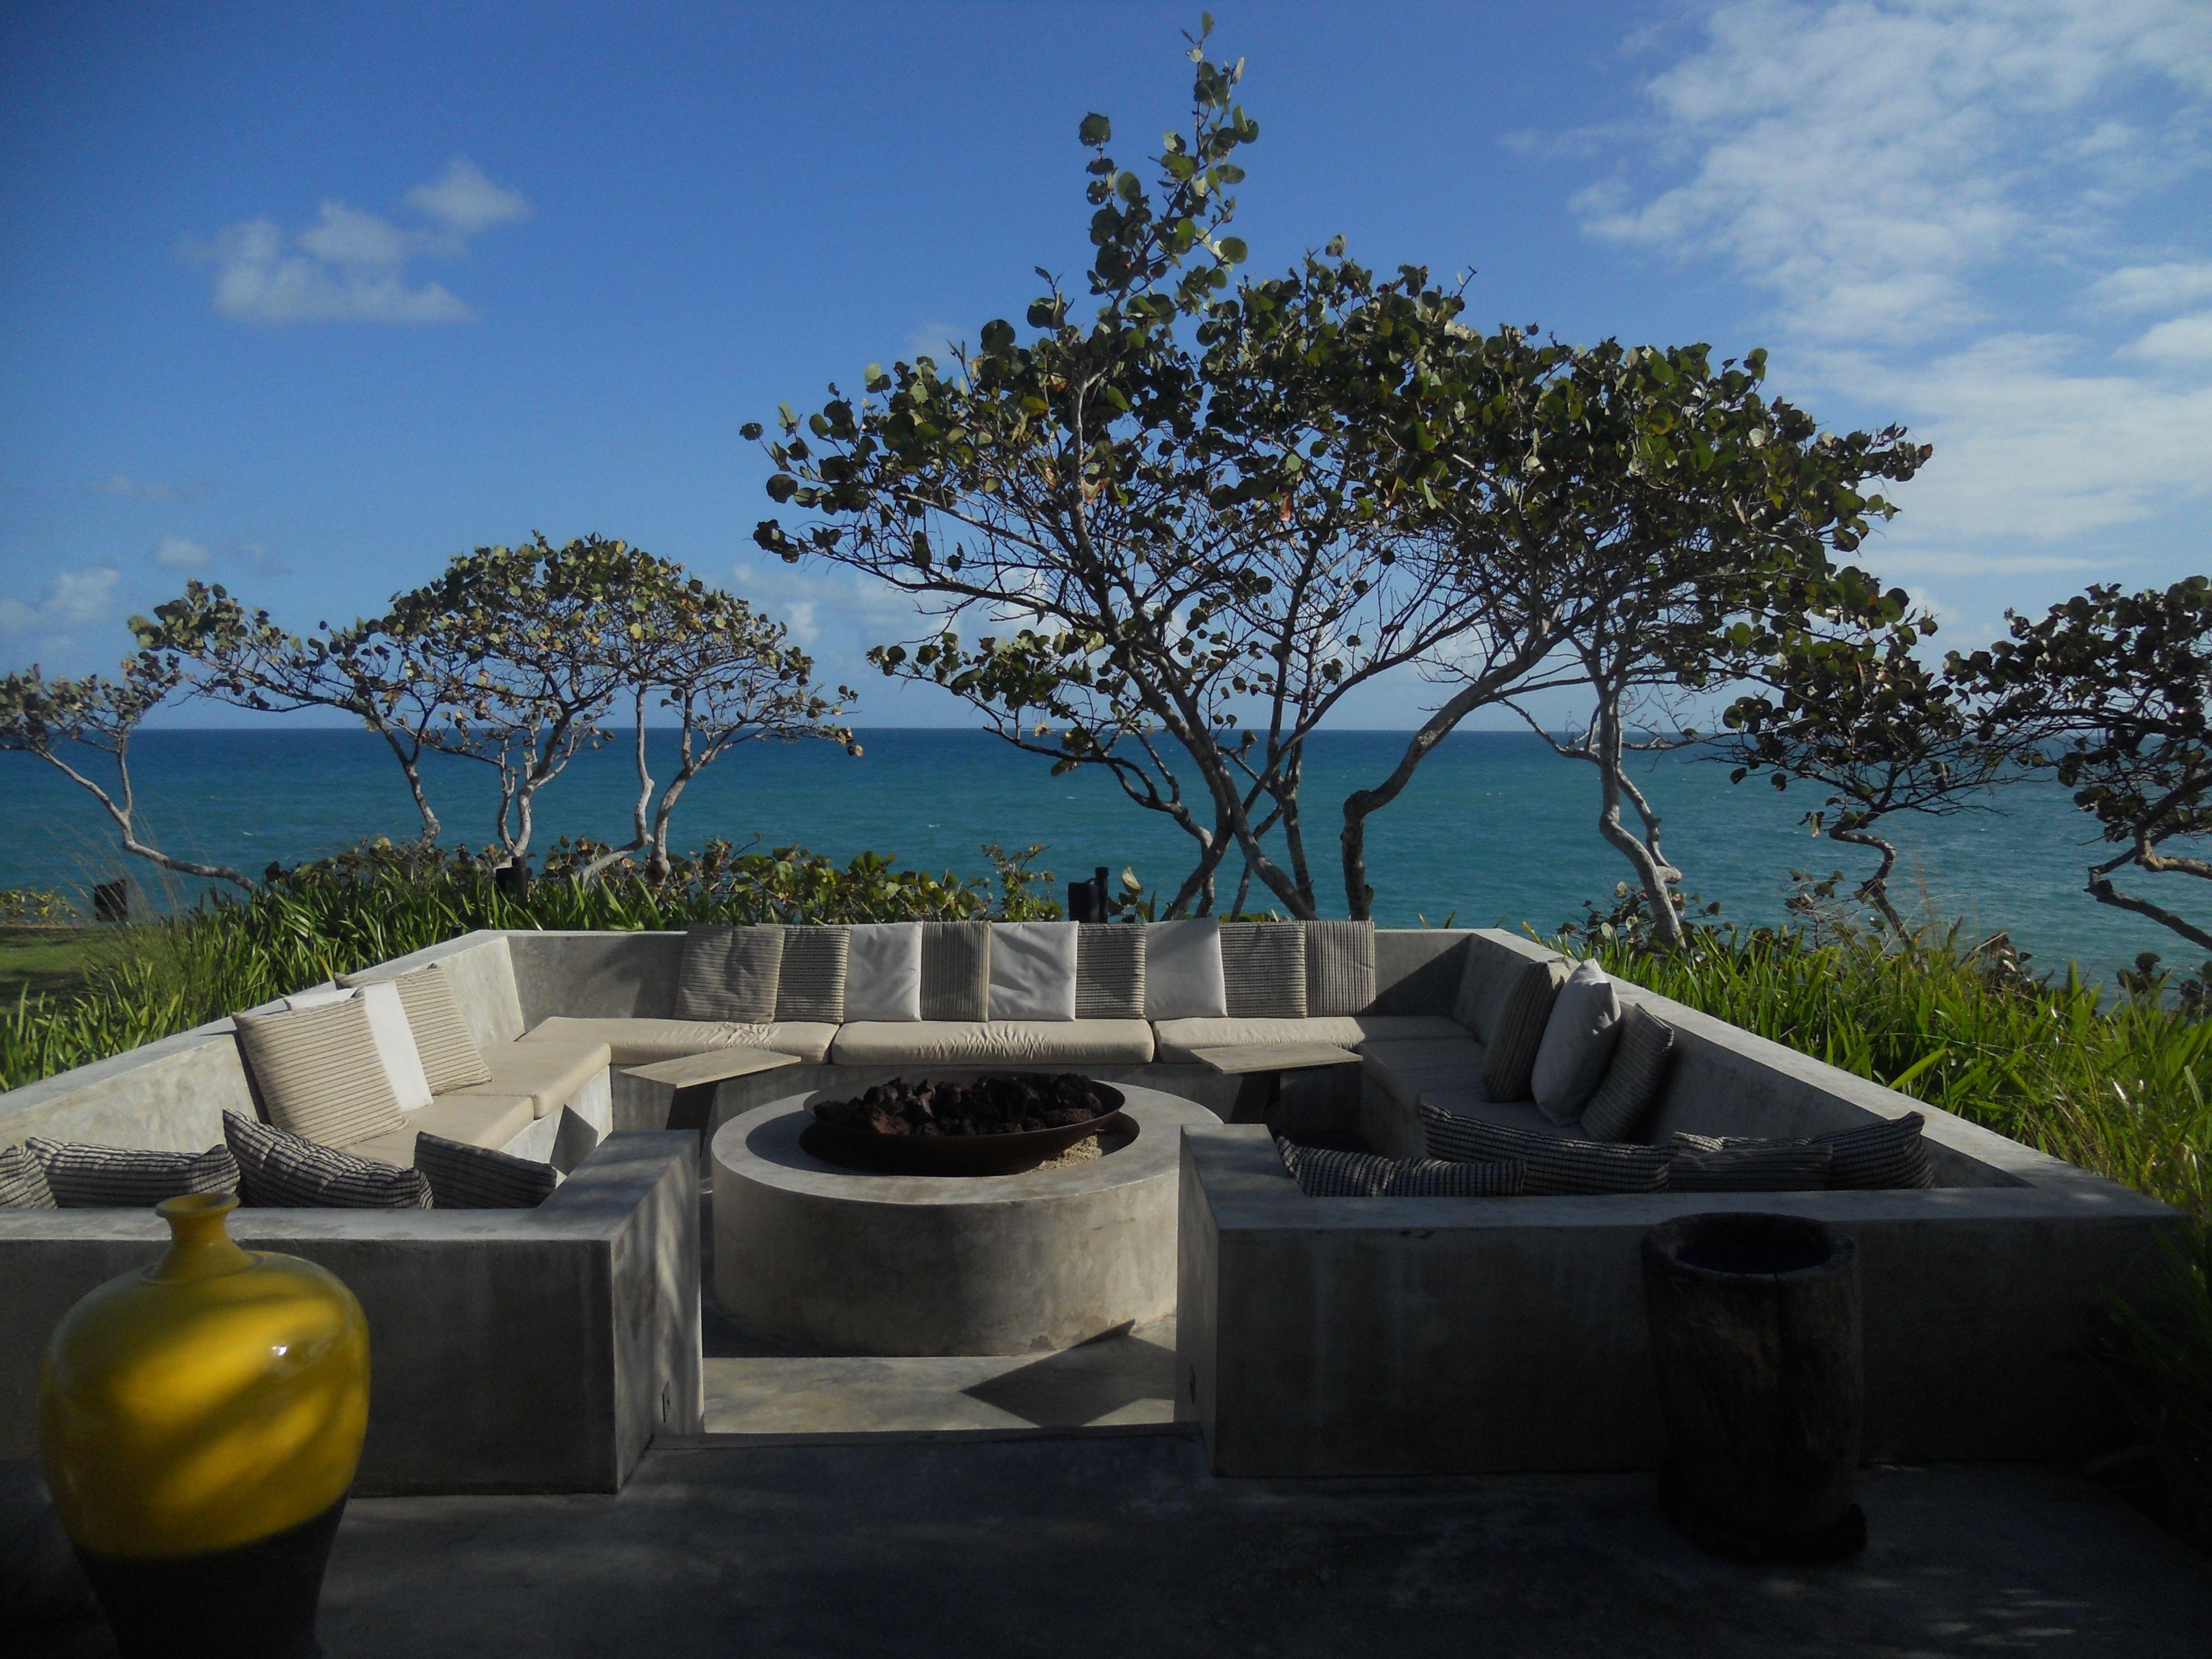 W Hotel Vieques Puerto Rico Favorite Places Spaces